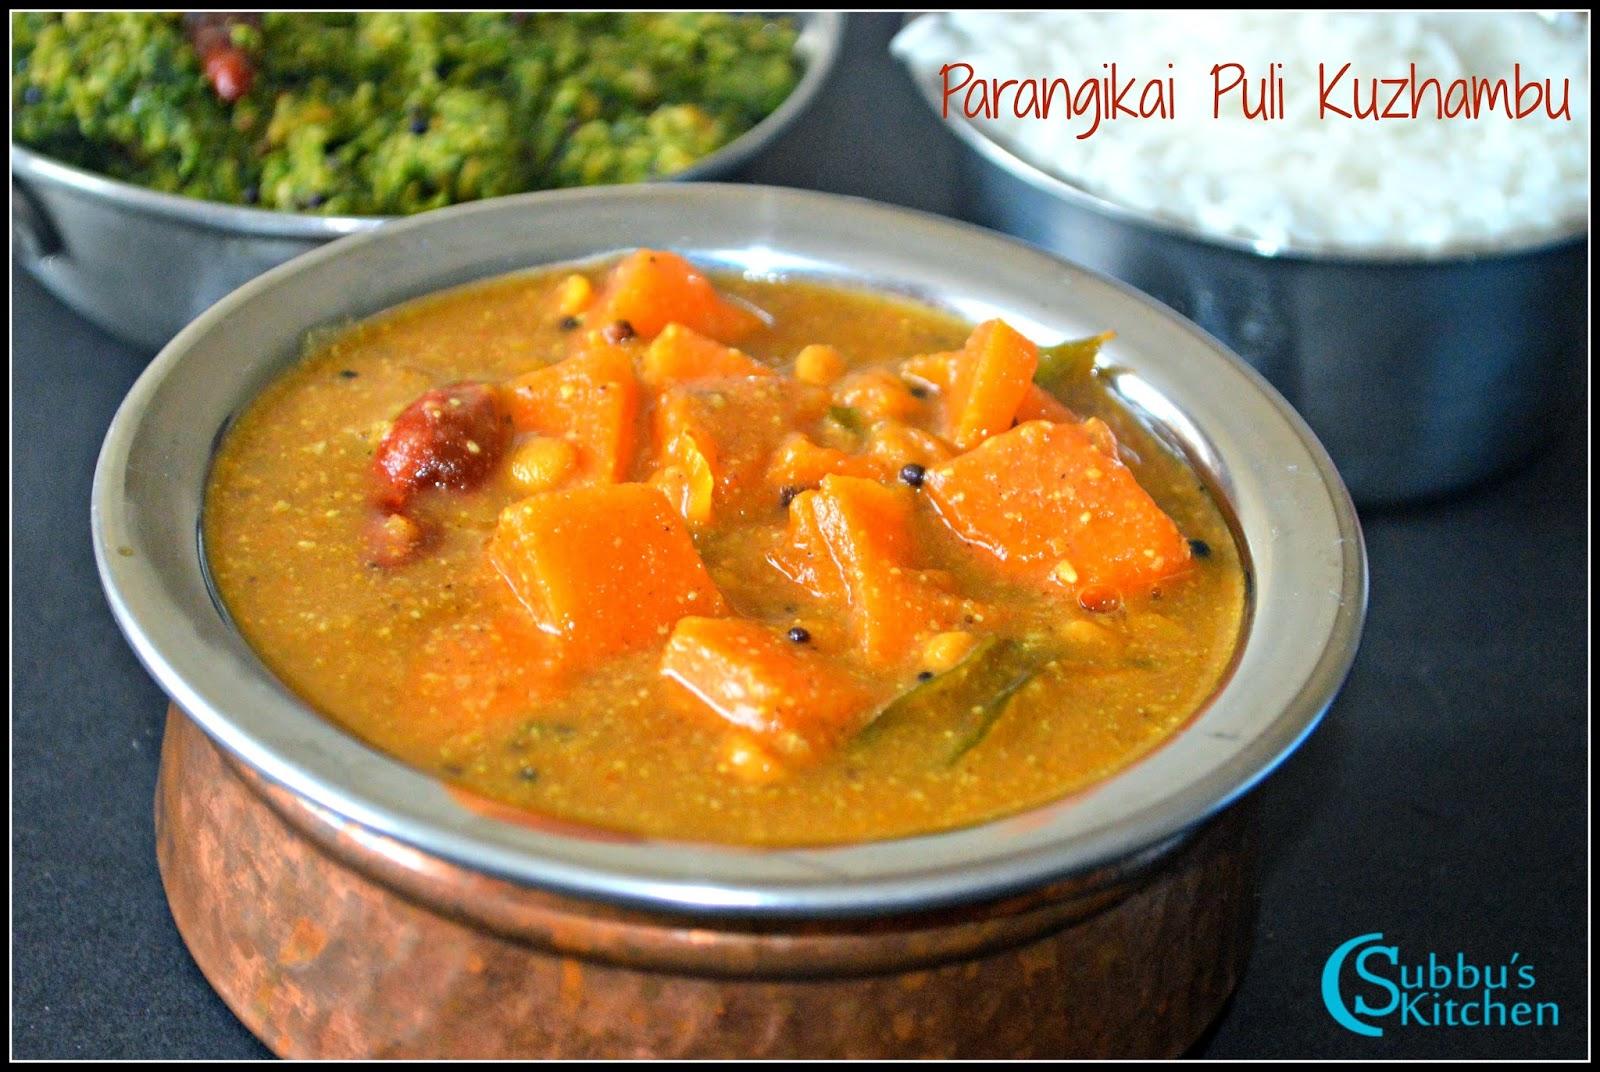 Parangikai Puli Kuzhambu Recipe | Yellow Pumpkin Kuzhambu